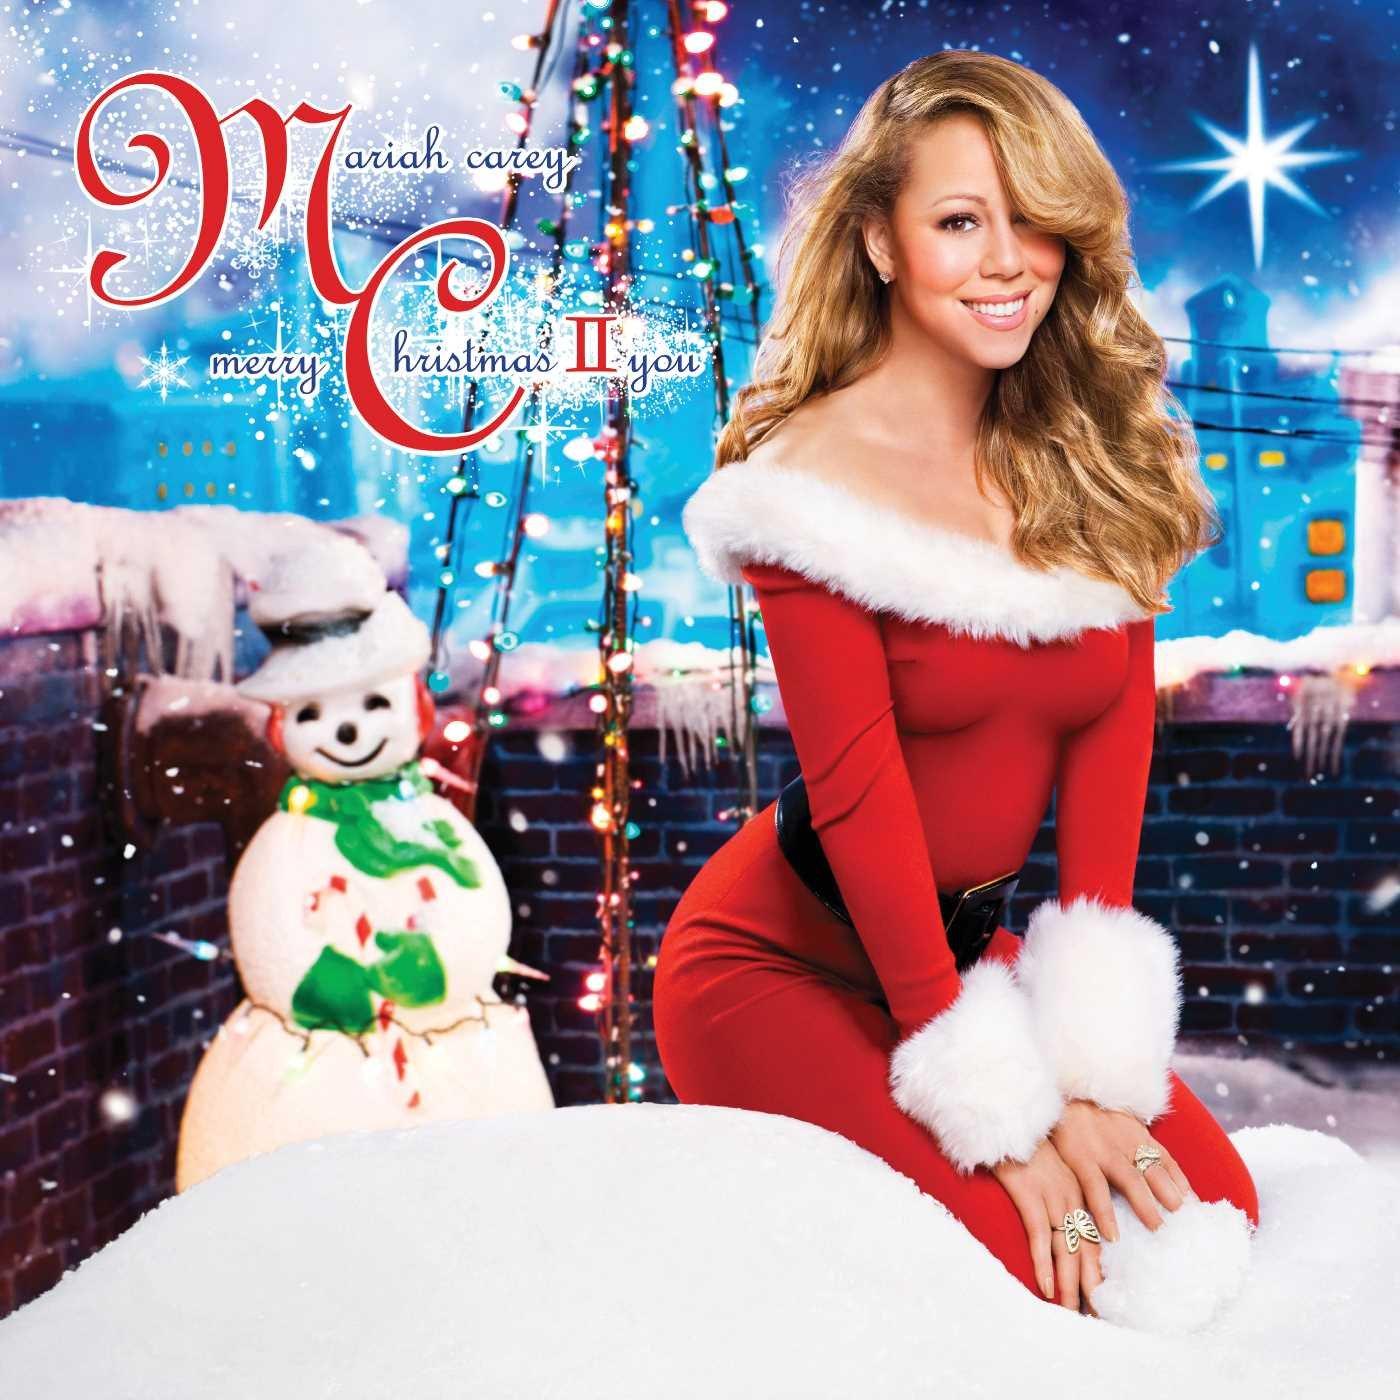 Merry Christmas II You - Mariah Carey: Amazon.de: Musik